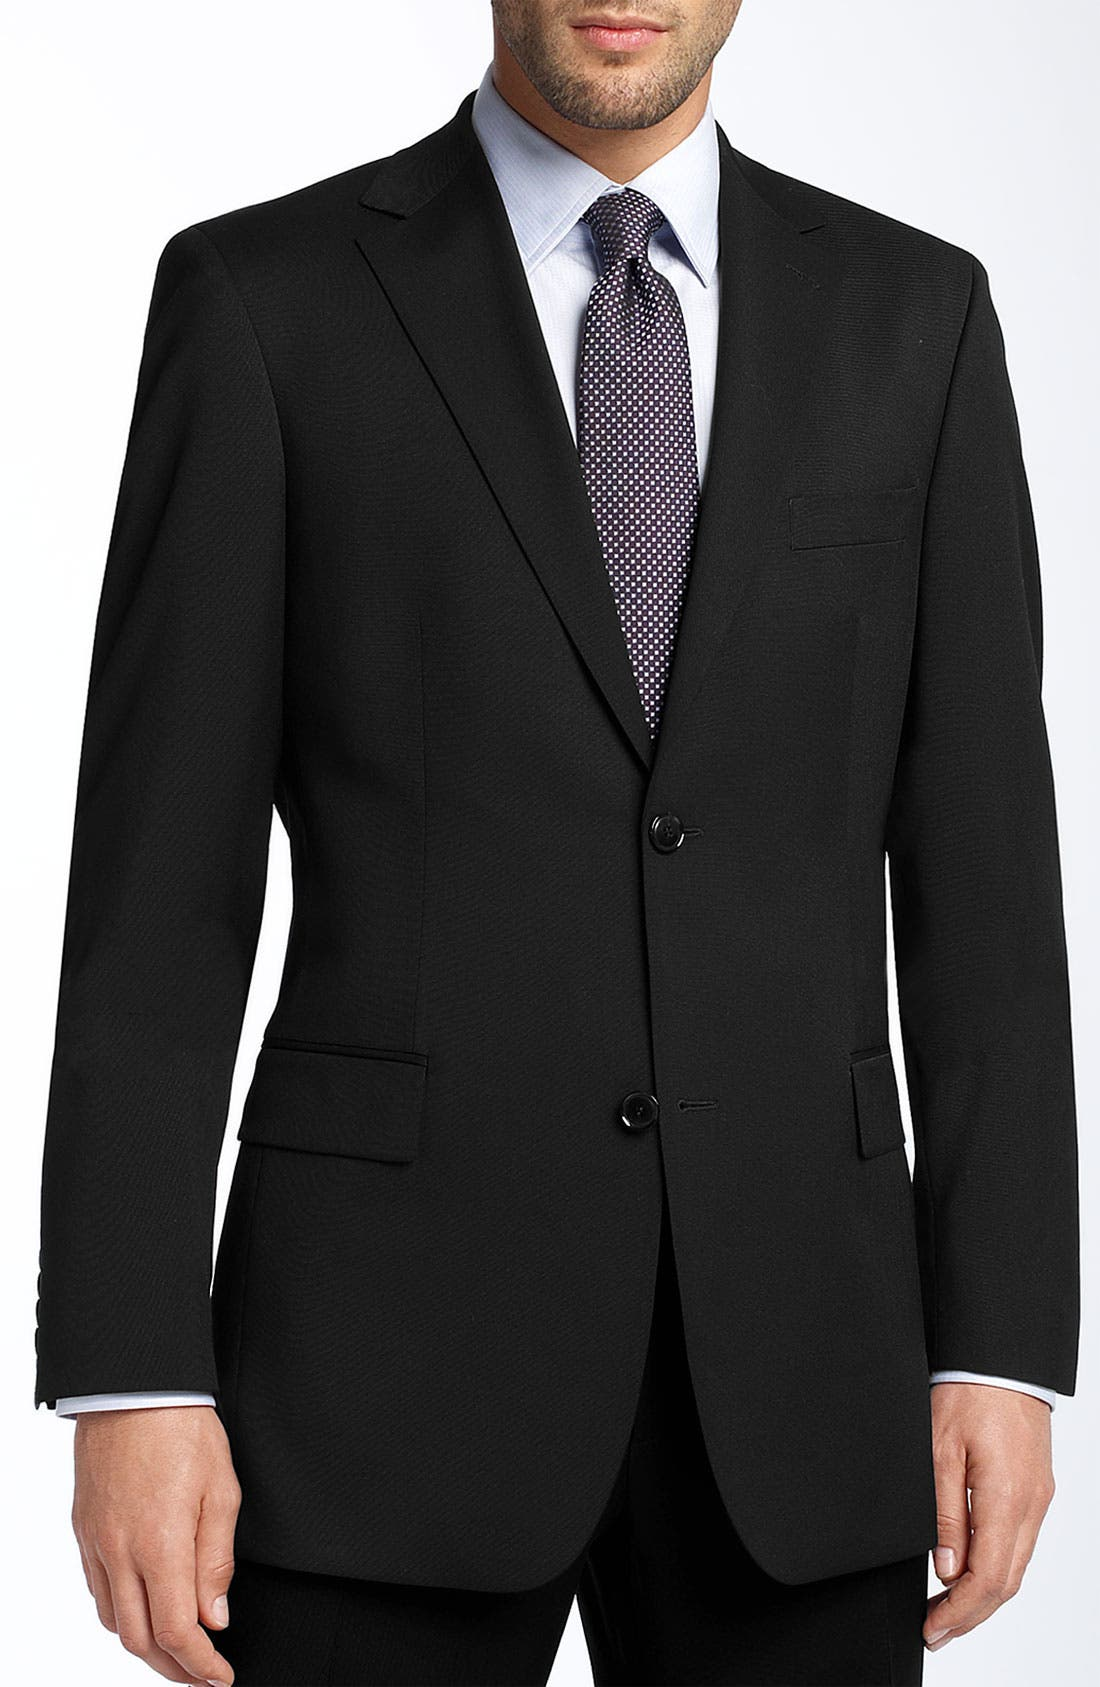 Alternate Image 1 Selected - BOSS HUGO BOSS 'Pasolini' Black Virgin Wool Sportcoat